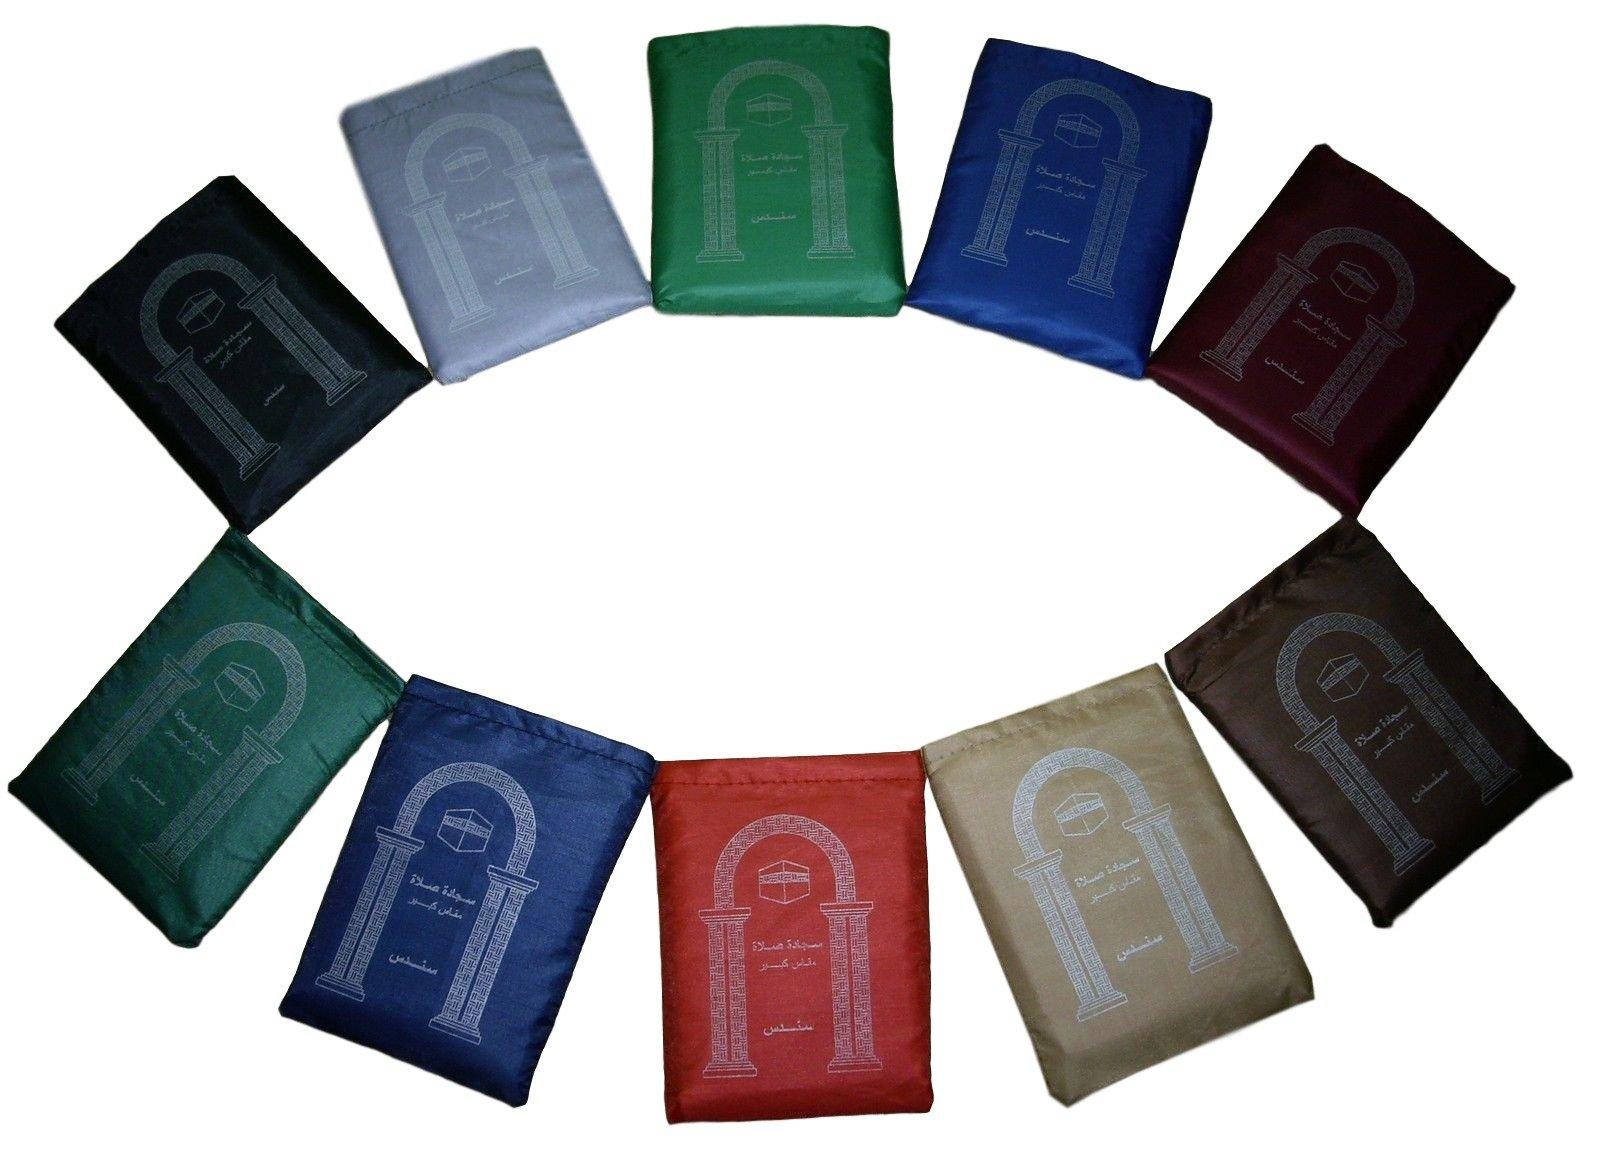 Sondos 14 Pocket Prayer Rug Mat Travel portable Islamic Outdoors Musallah Carpet Muslim by Sondos